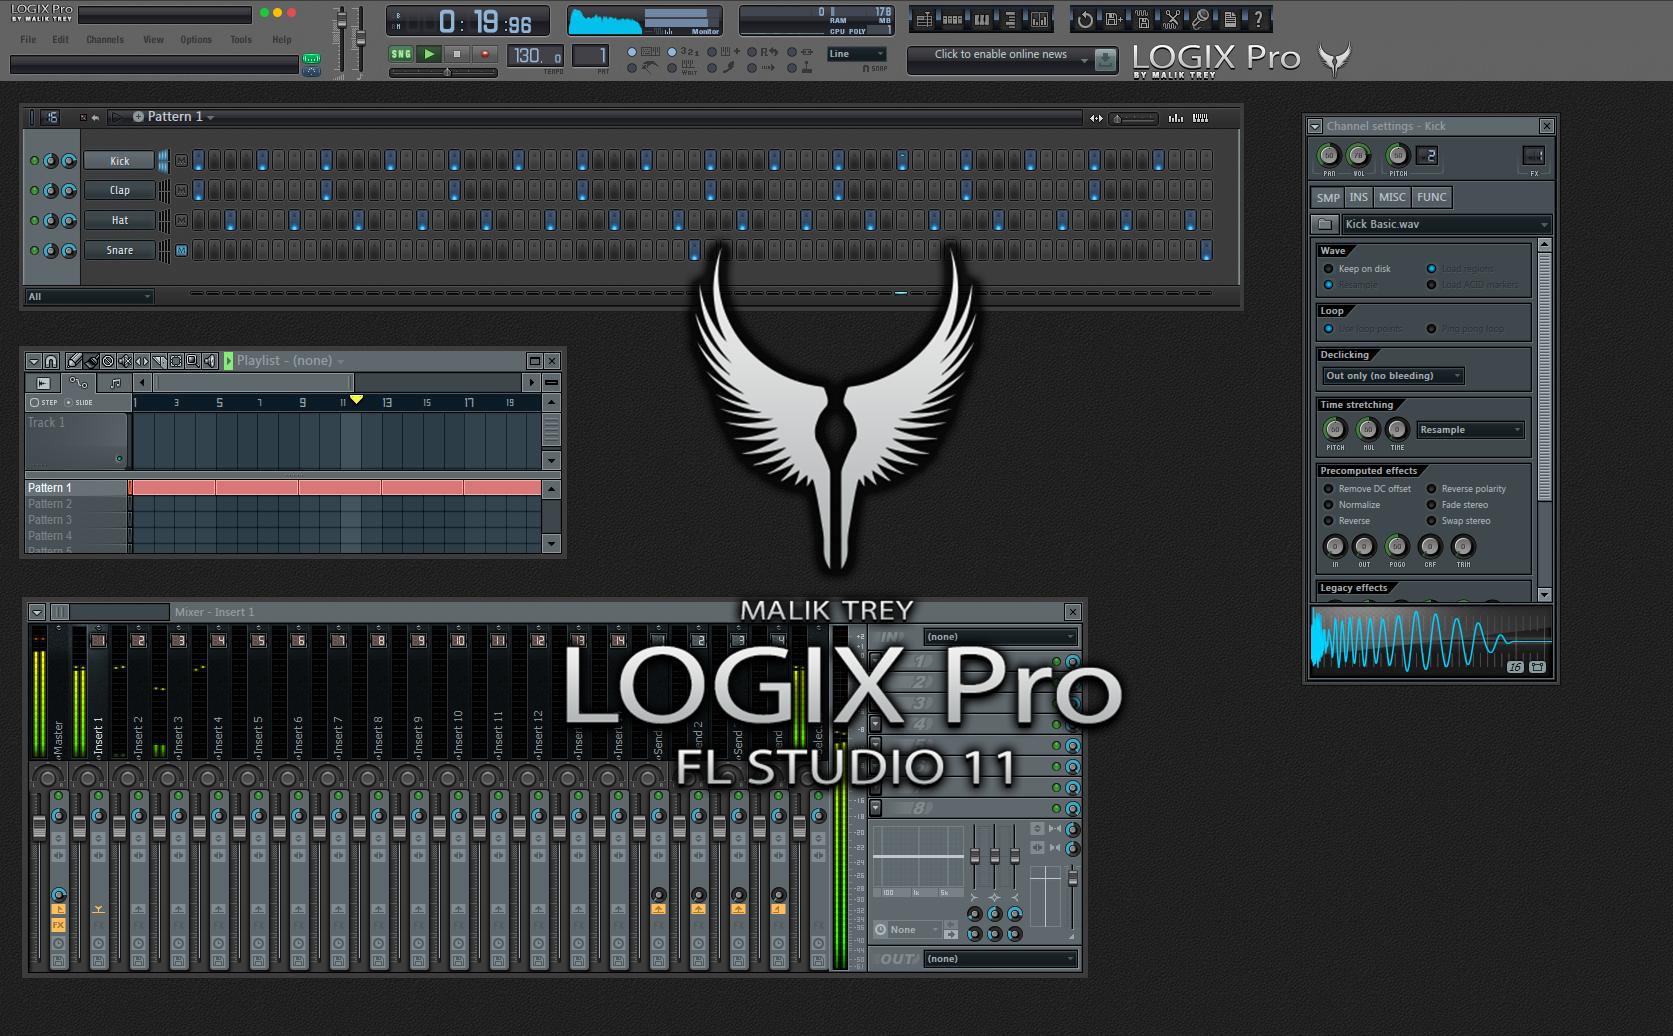 fl studio 20.1.1 skin